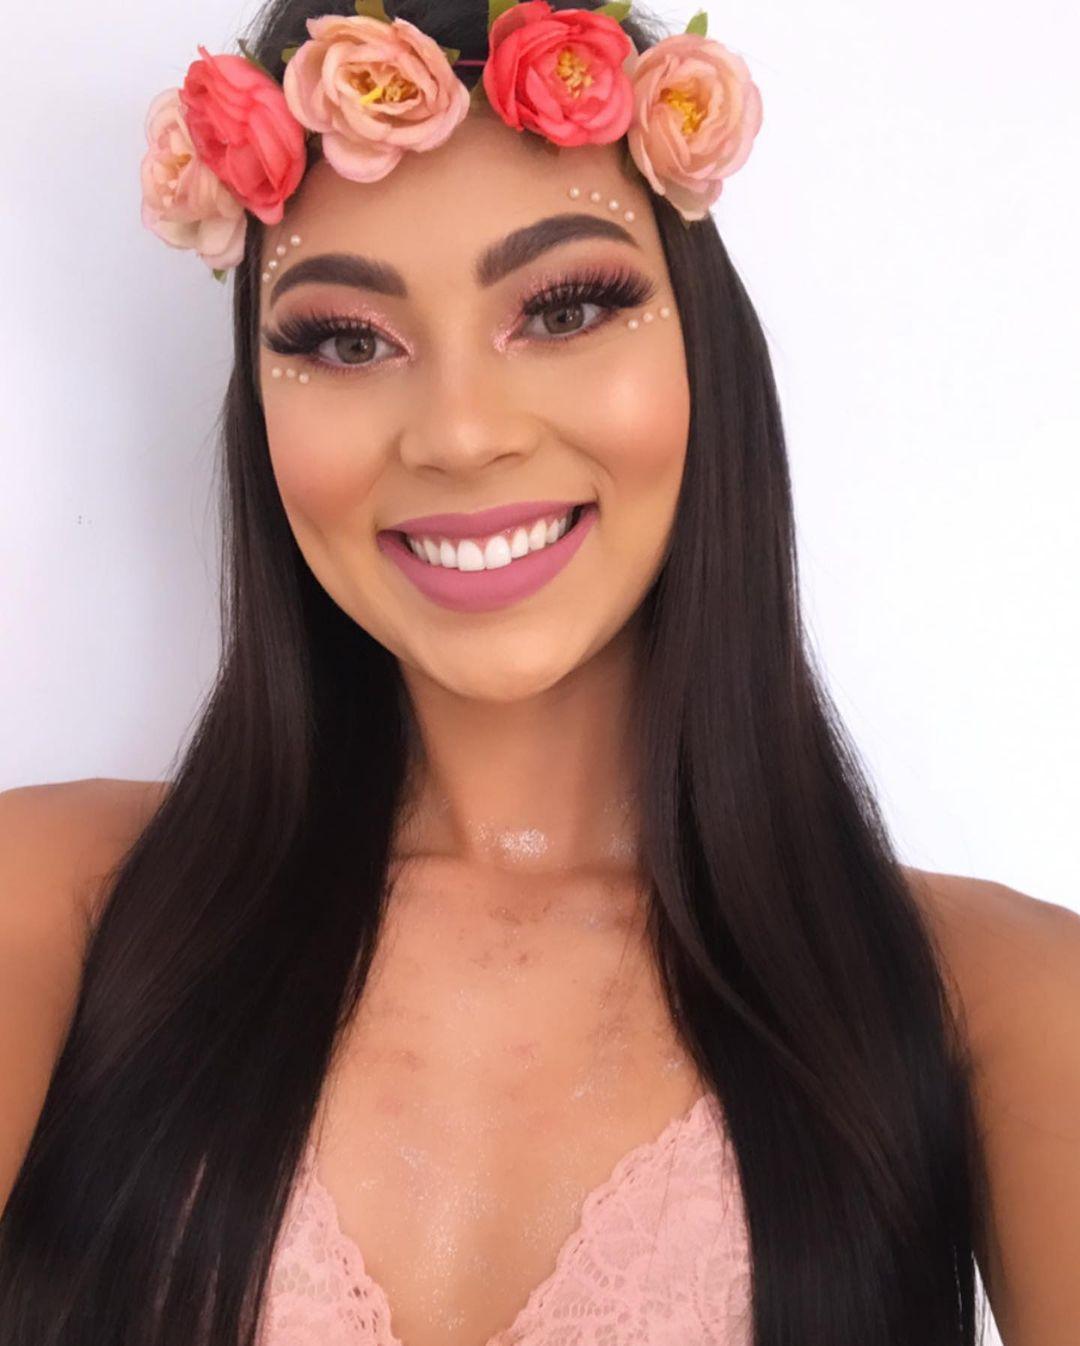 julia alves, miss cerrado goiano mundo 2019. - Página 5 Fumnx210